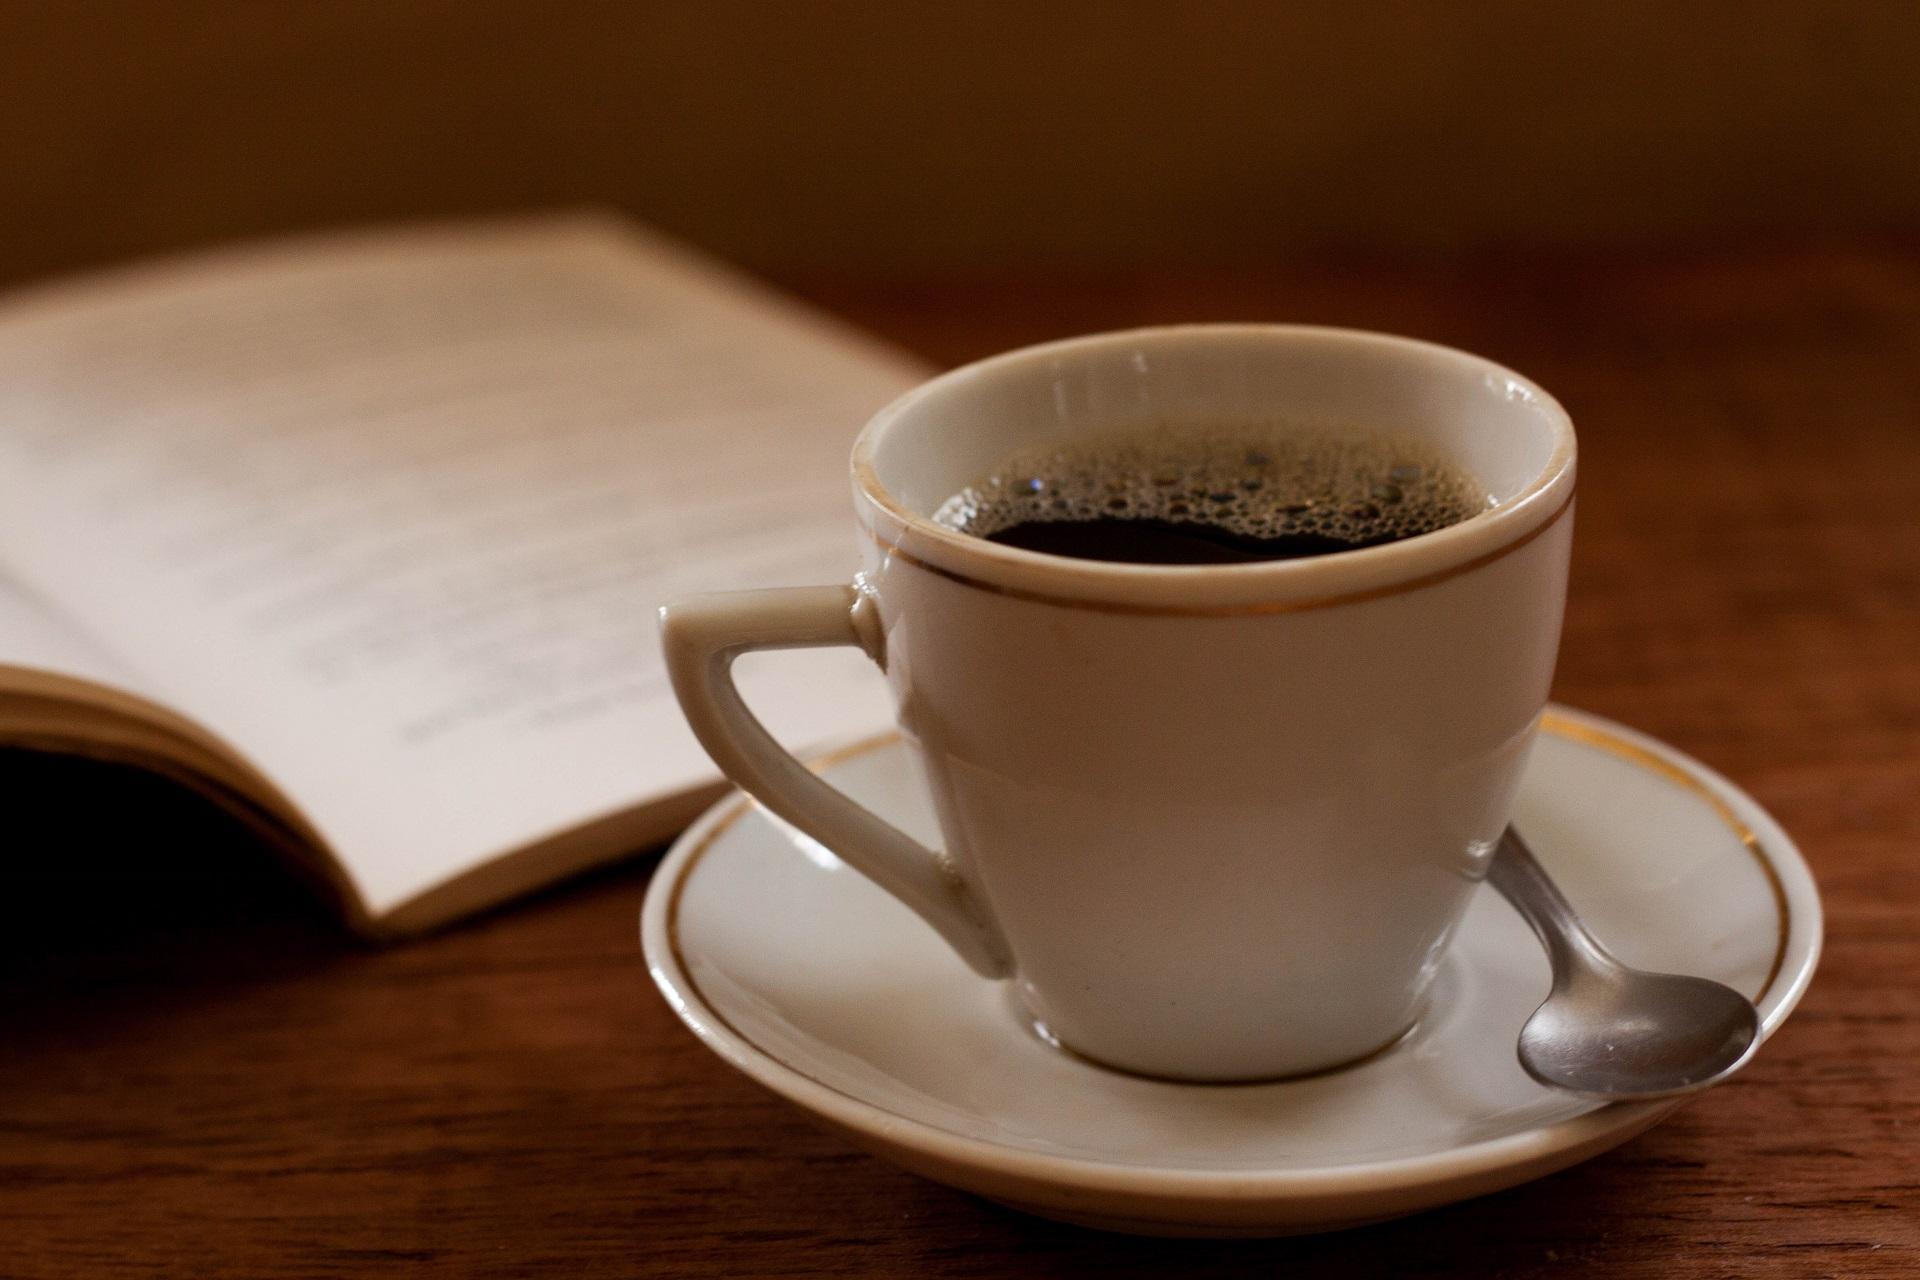 kofe-napitok-ili-lekarstvo